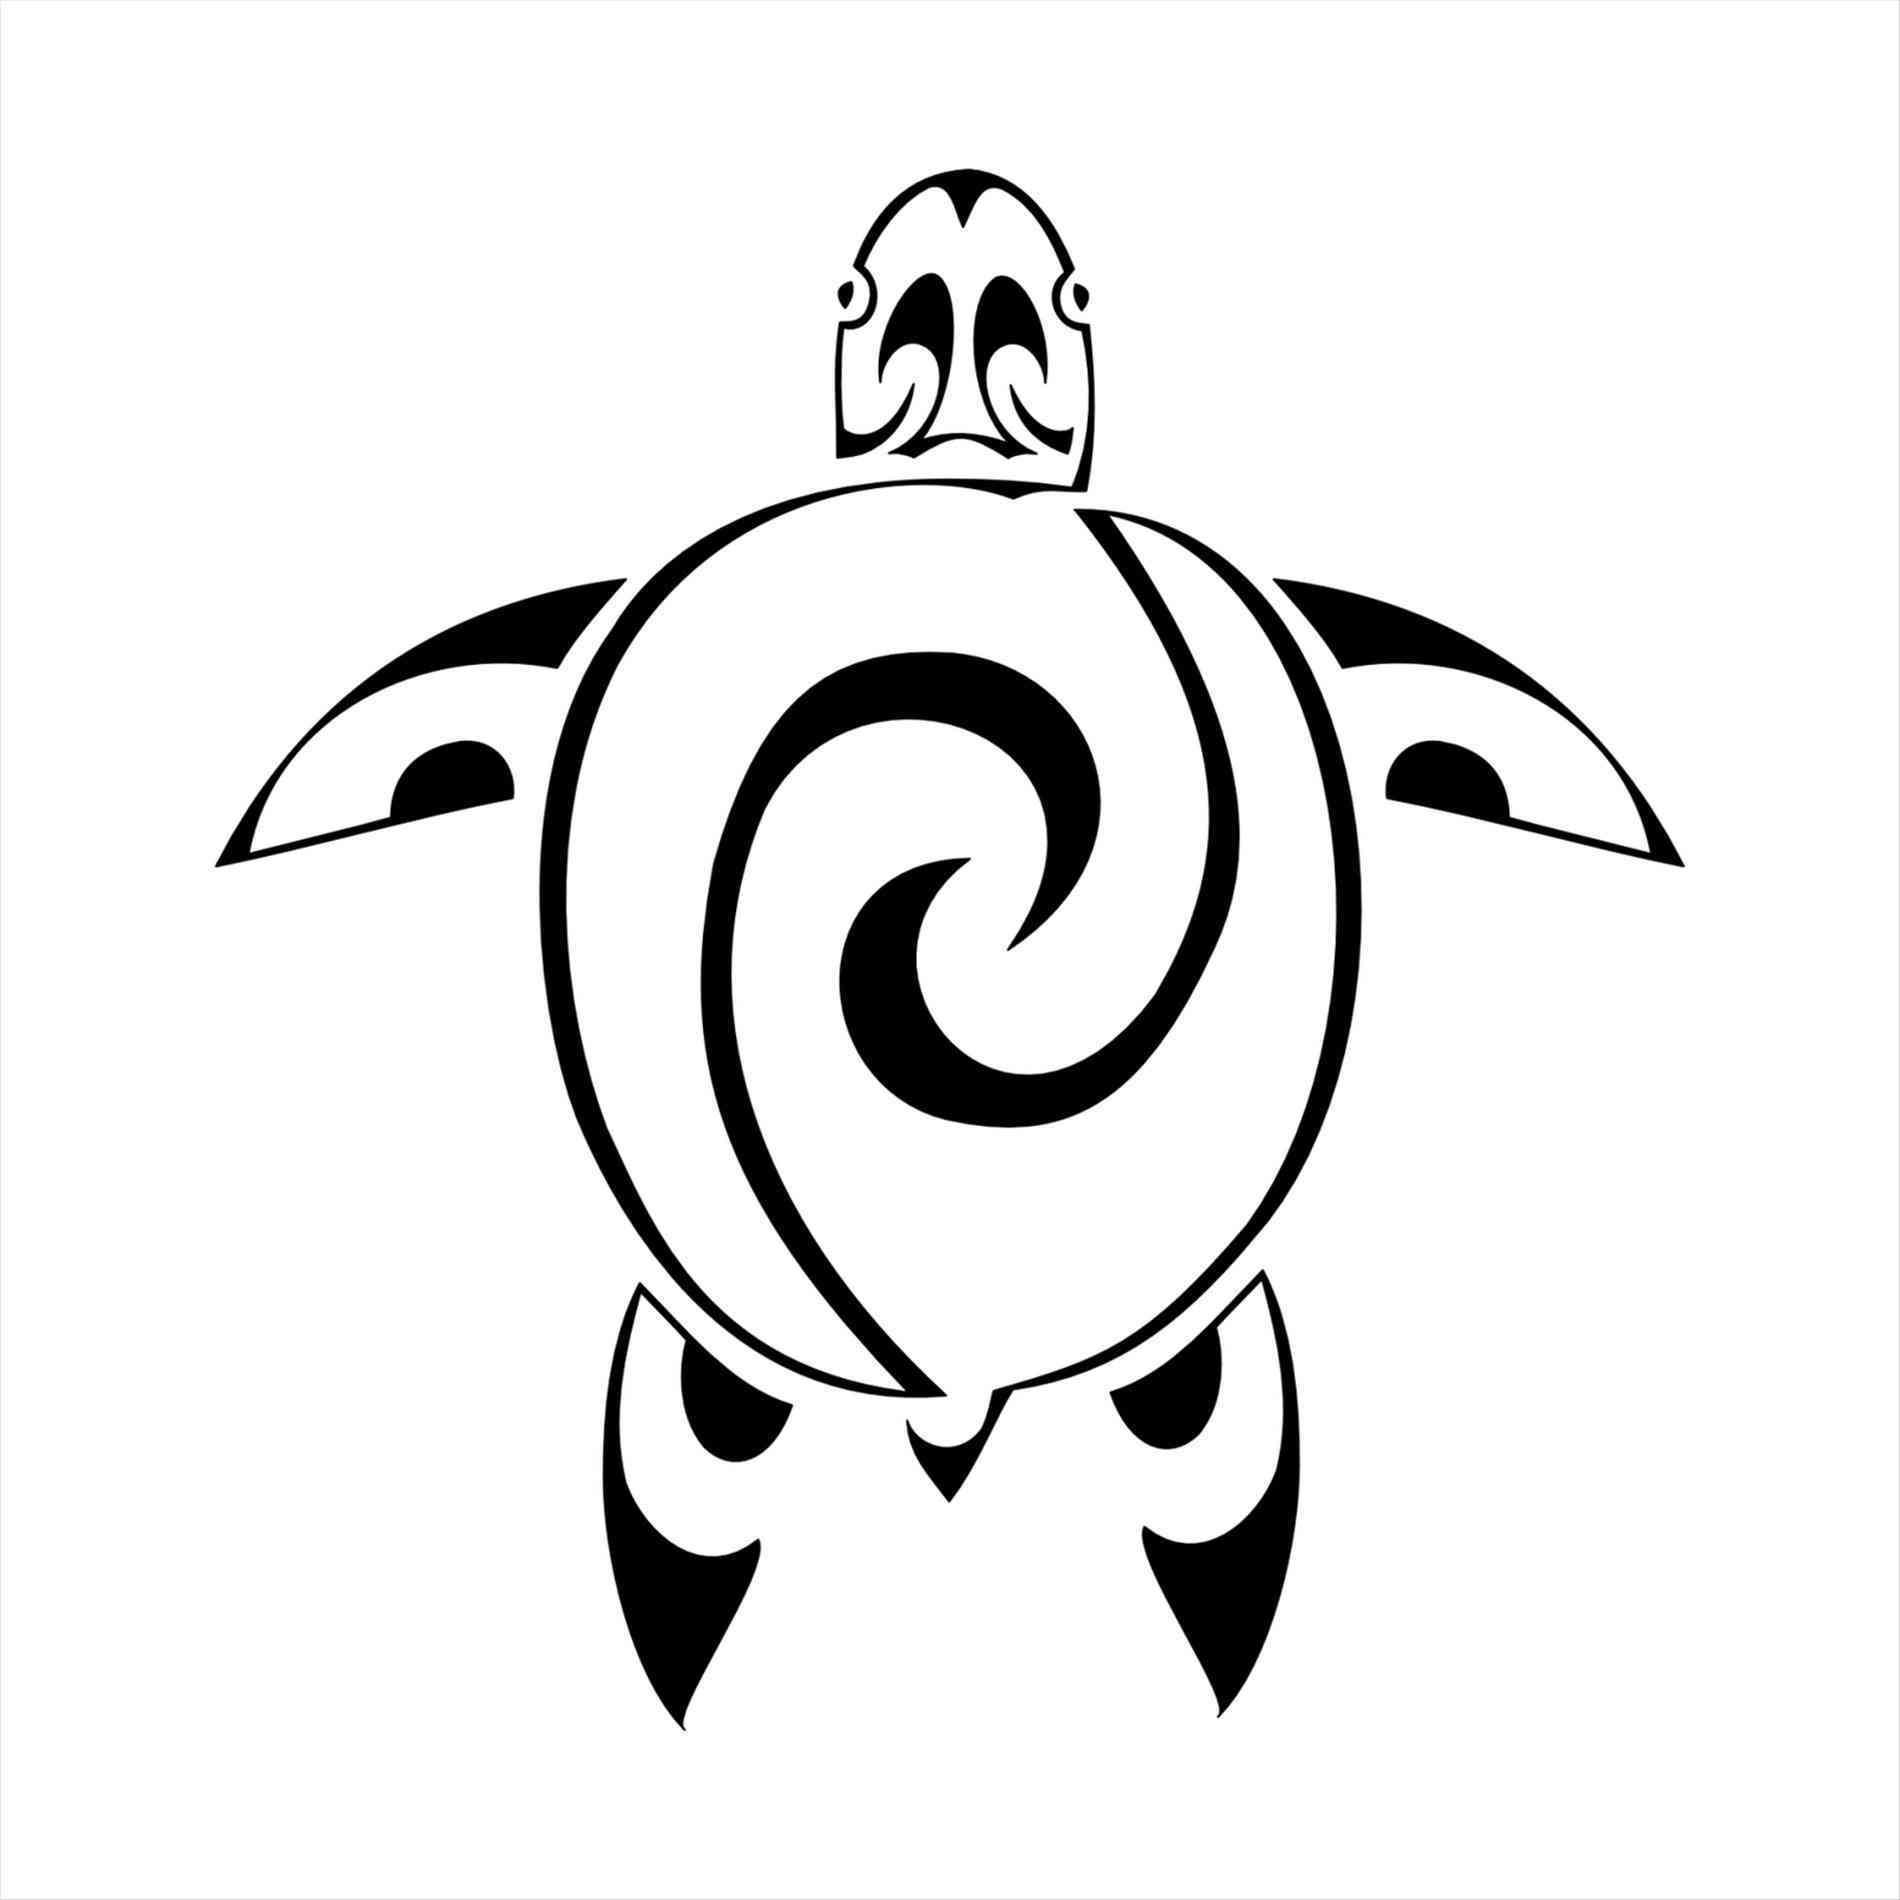 1900x1900 Hawaiian Tattoos Design And Ideas Drawn Turtle Polynesian Pencil